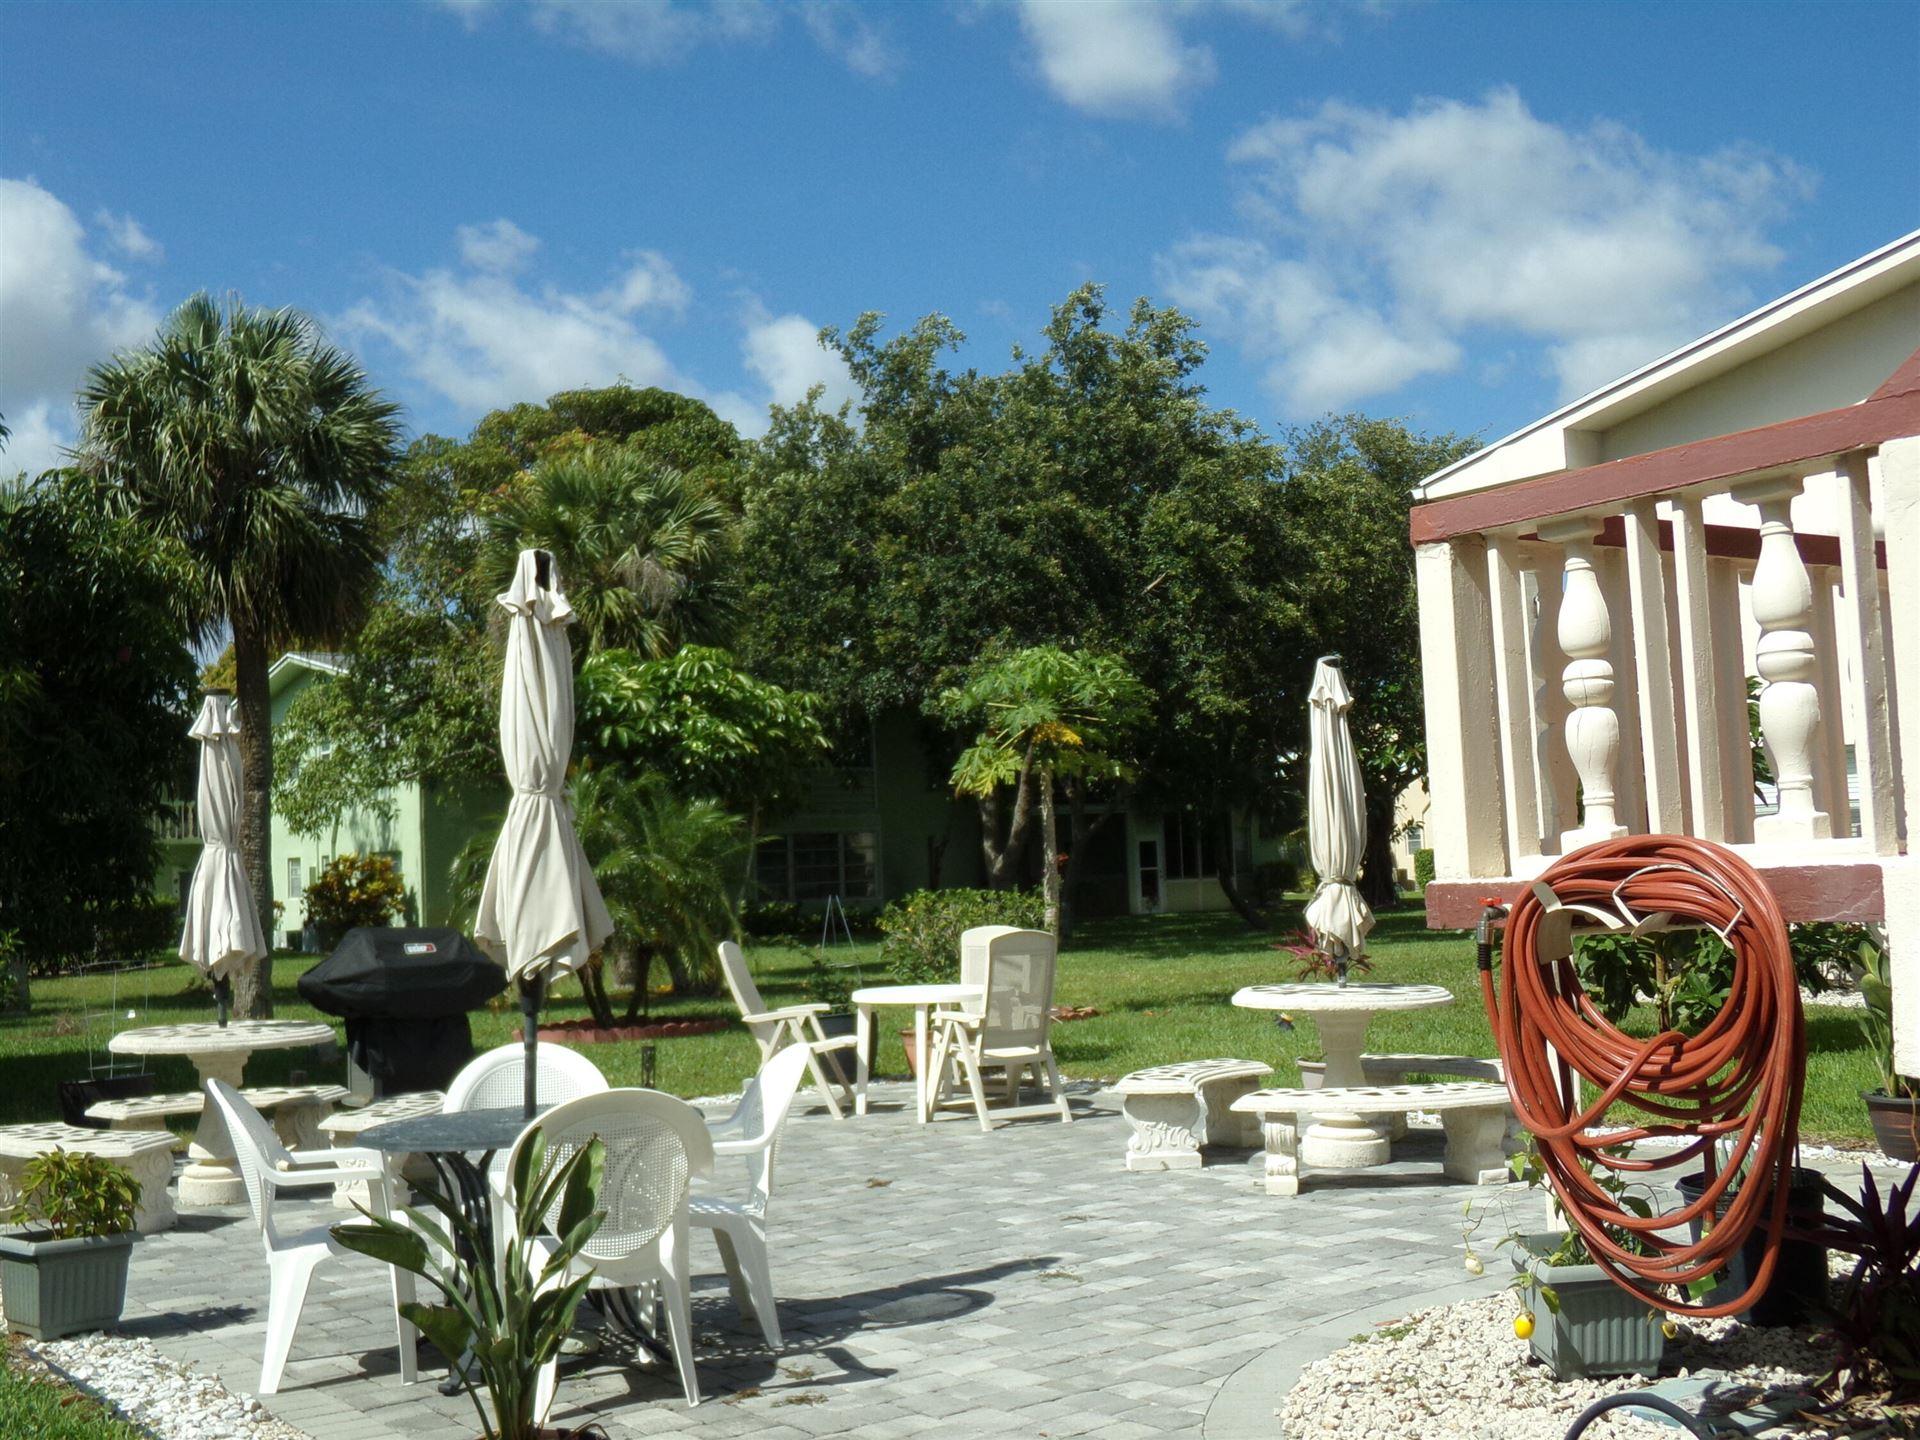 76 Norwich D, West Palm Beach, FL 33417 - MLS#: RX-10716606